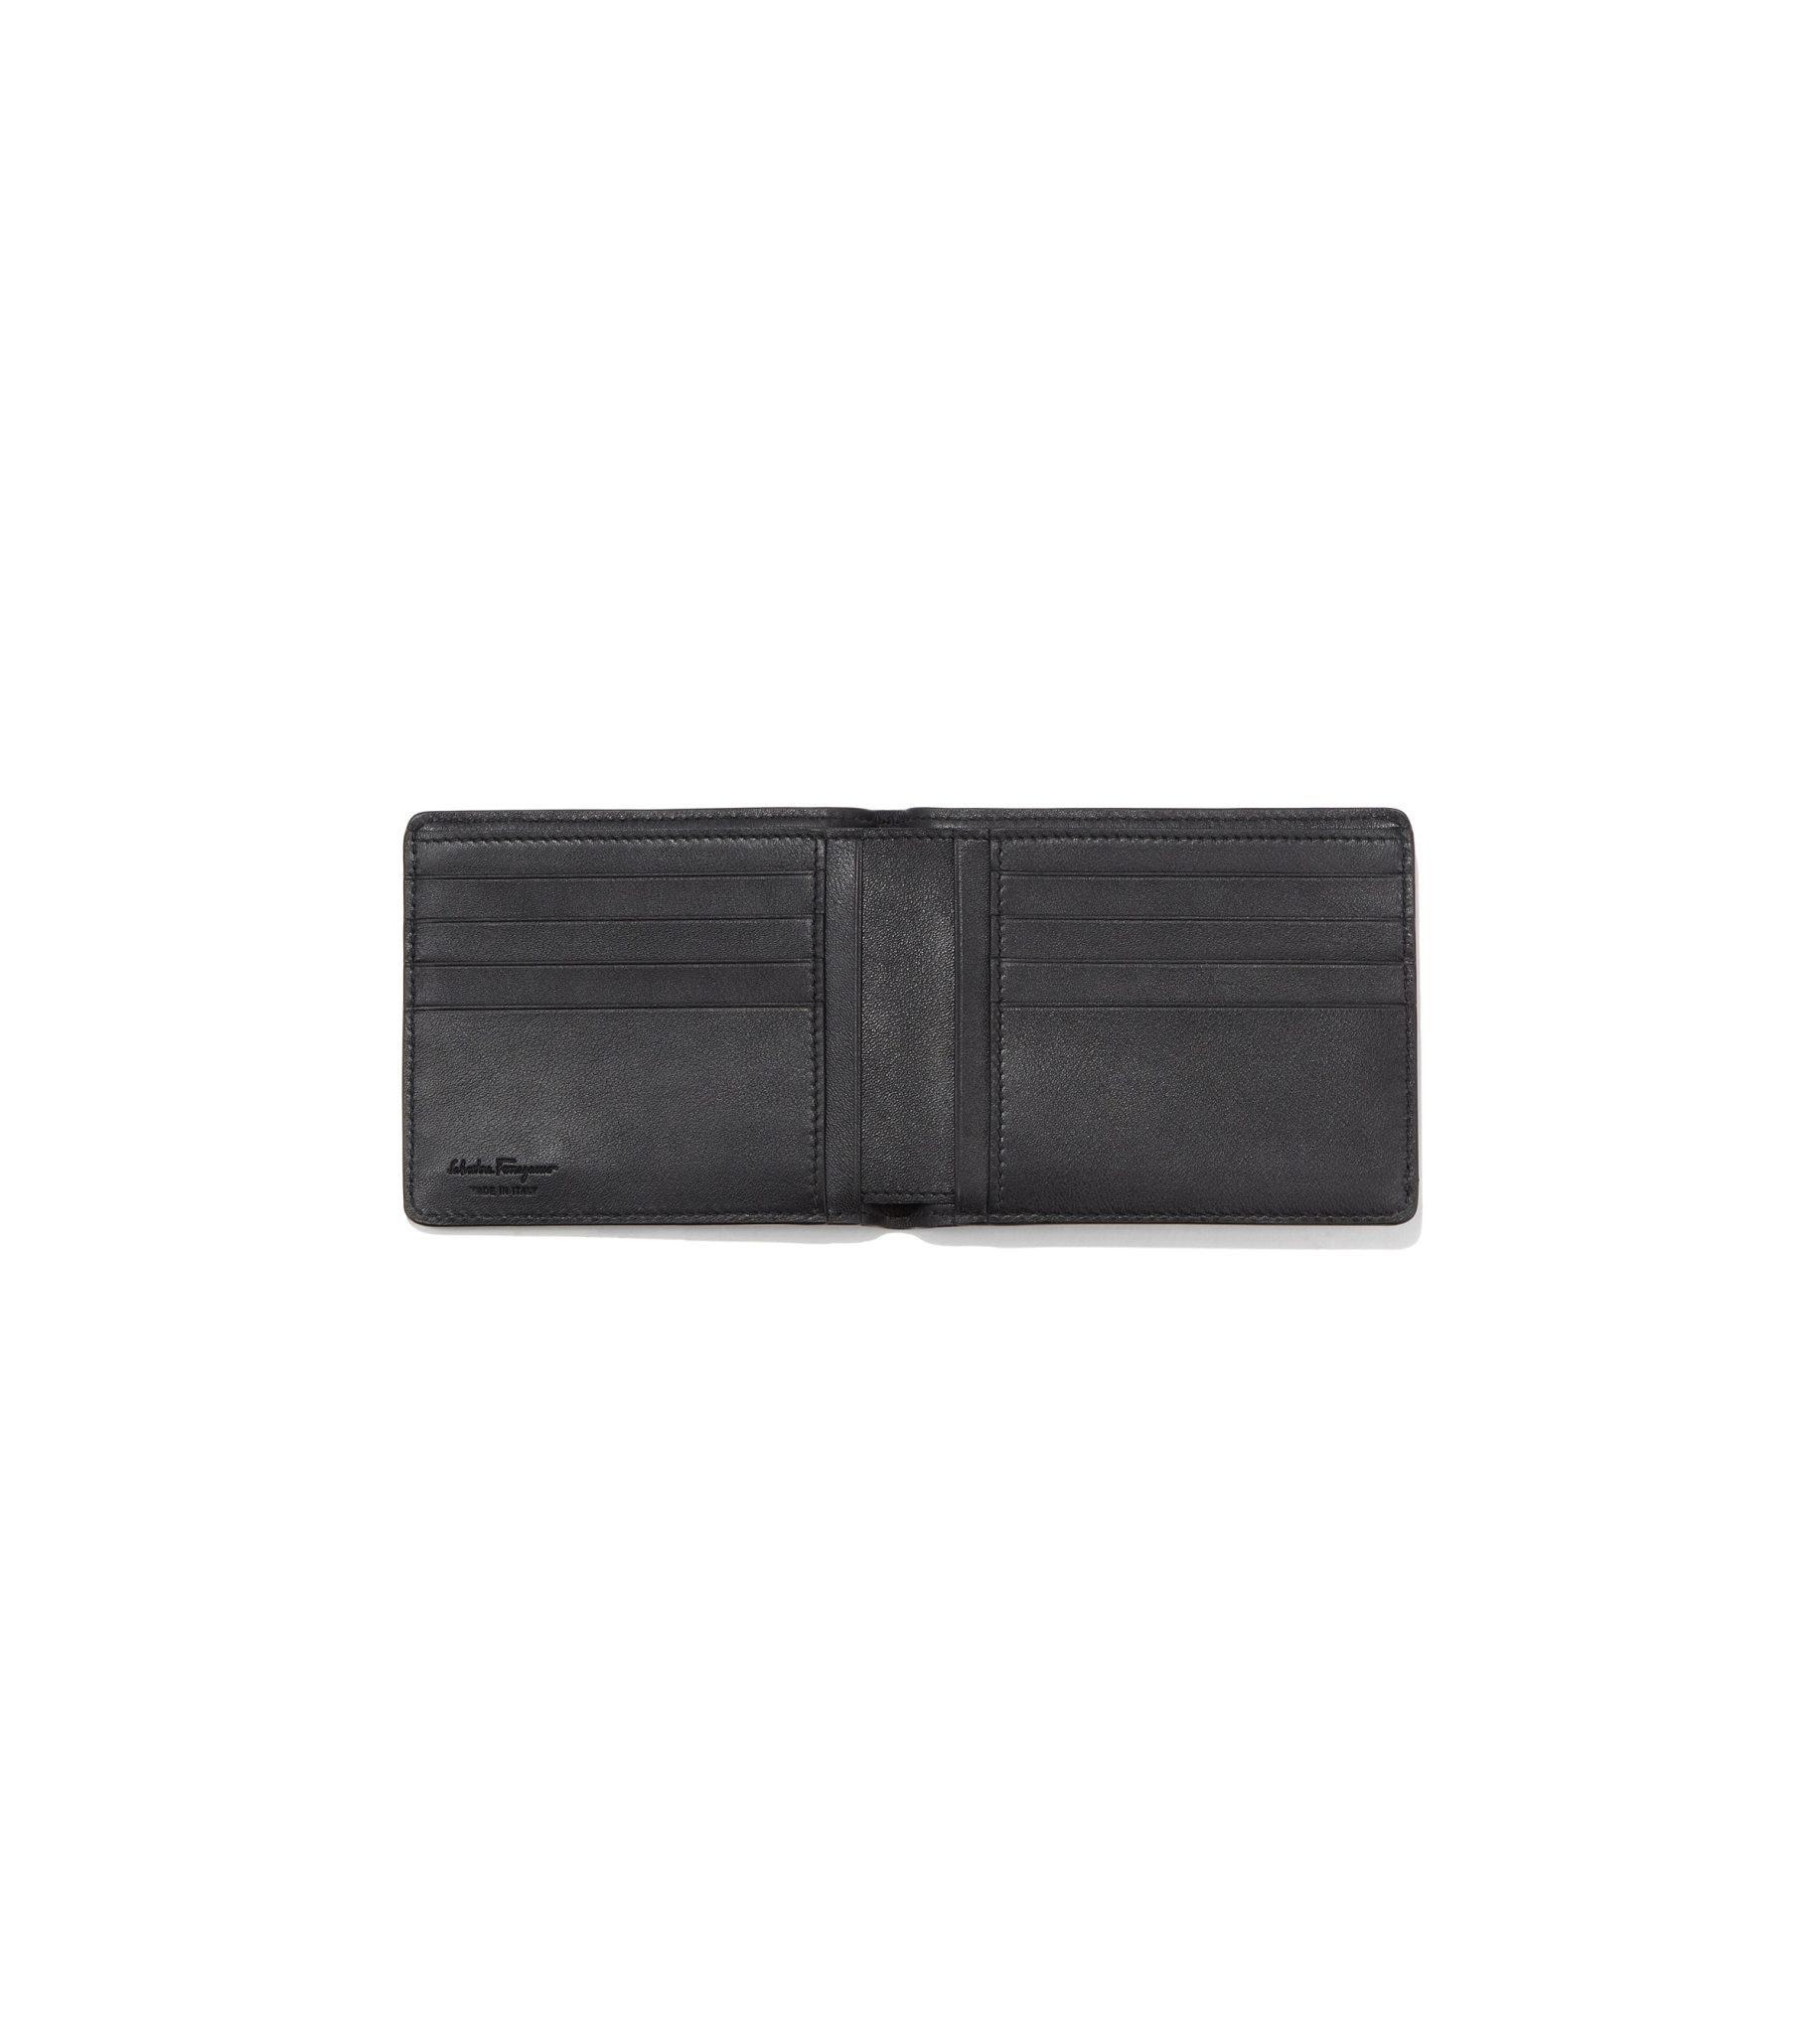 SALVATORE FERRAGAMO Salvatore Ferragamo - Men's Wallet - 0670646